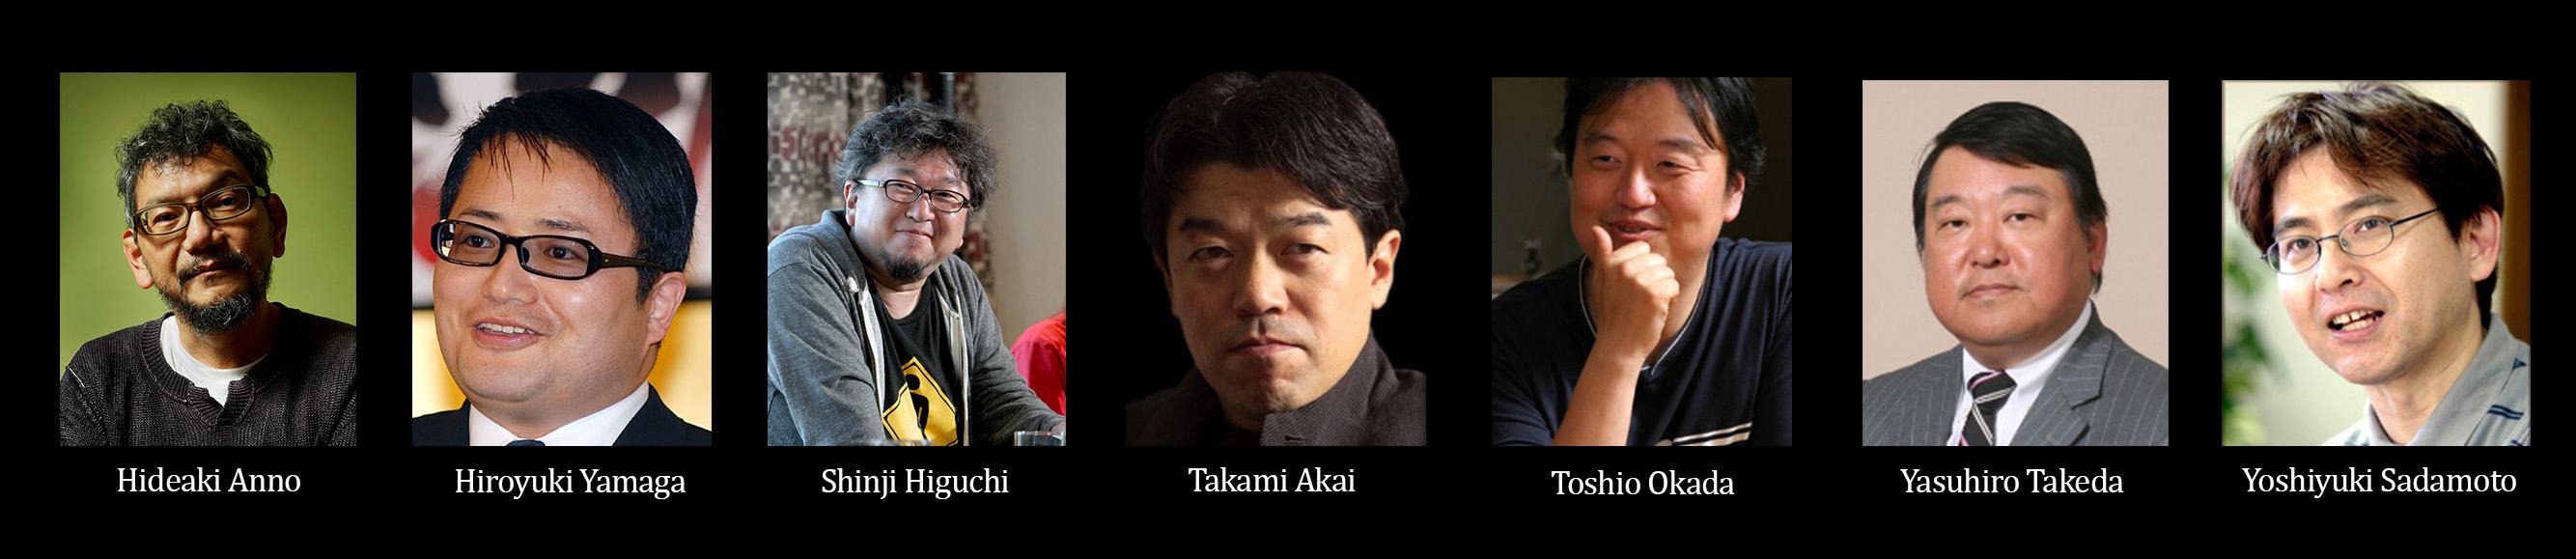 3. creators